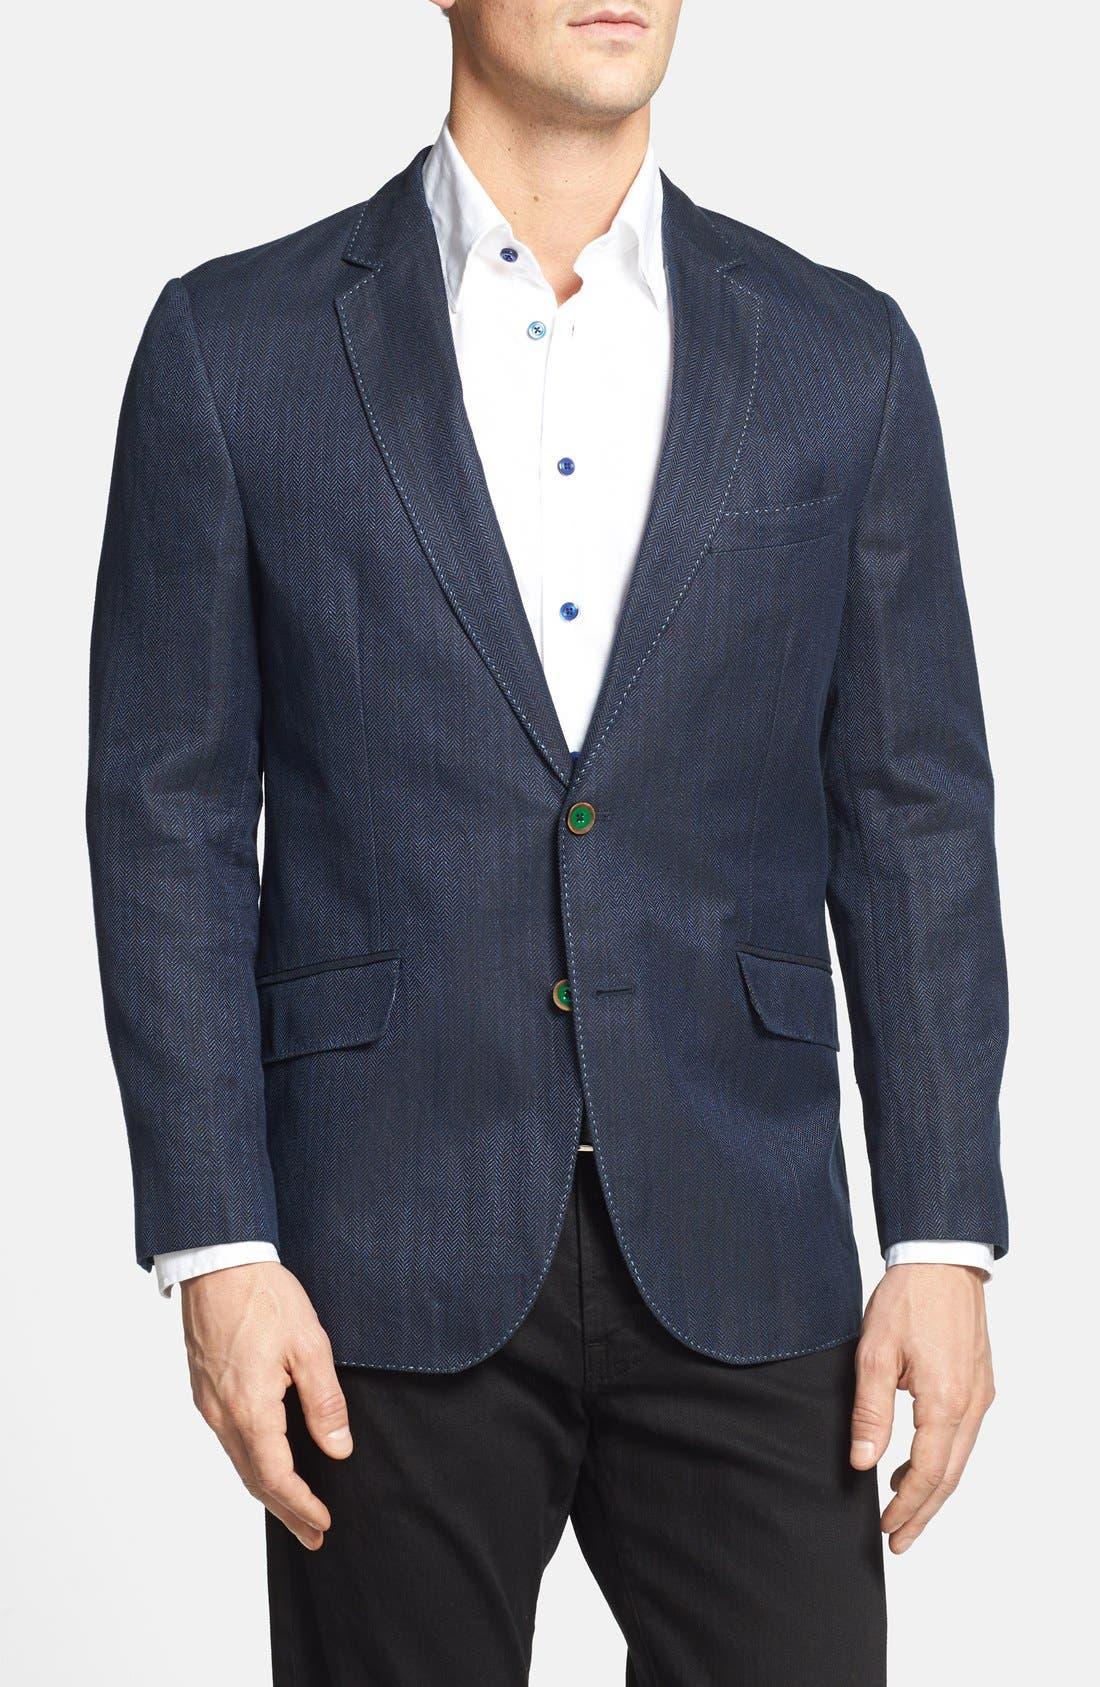 Alternate Image 1 Selected - Robert Graham 'Campbell' Linen Blend Sportcoat